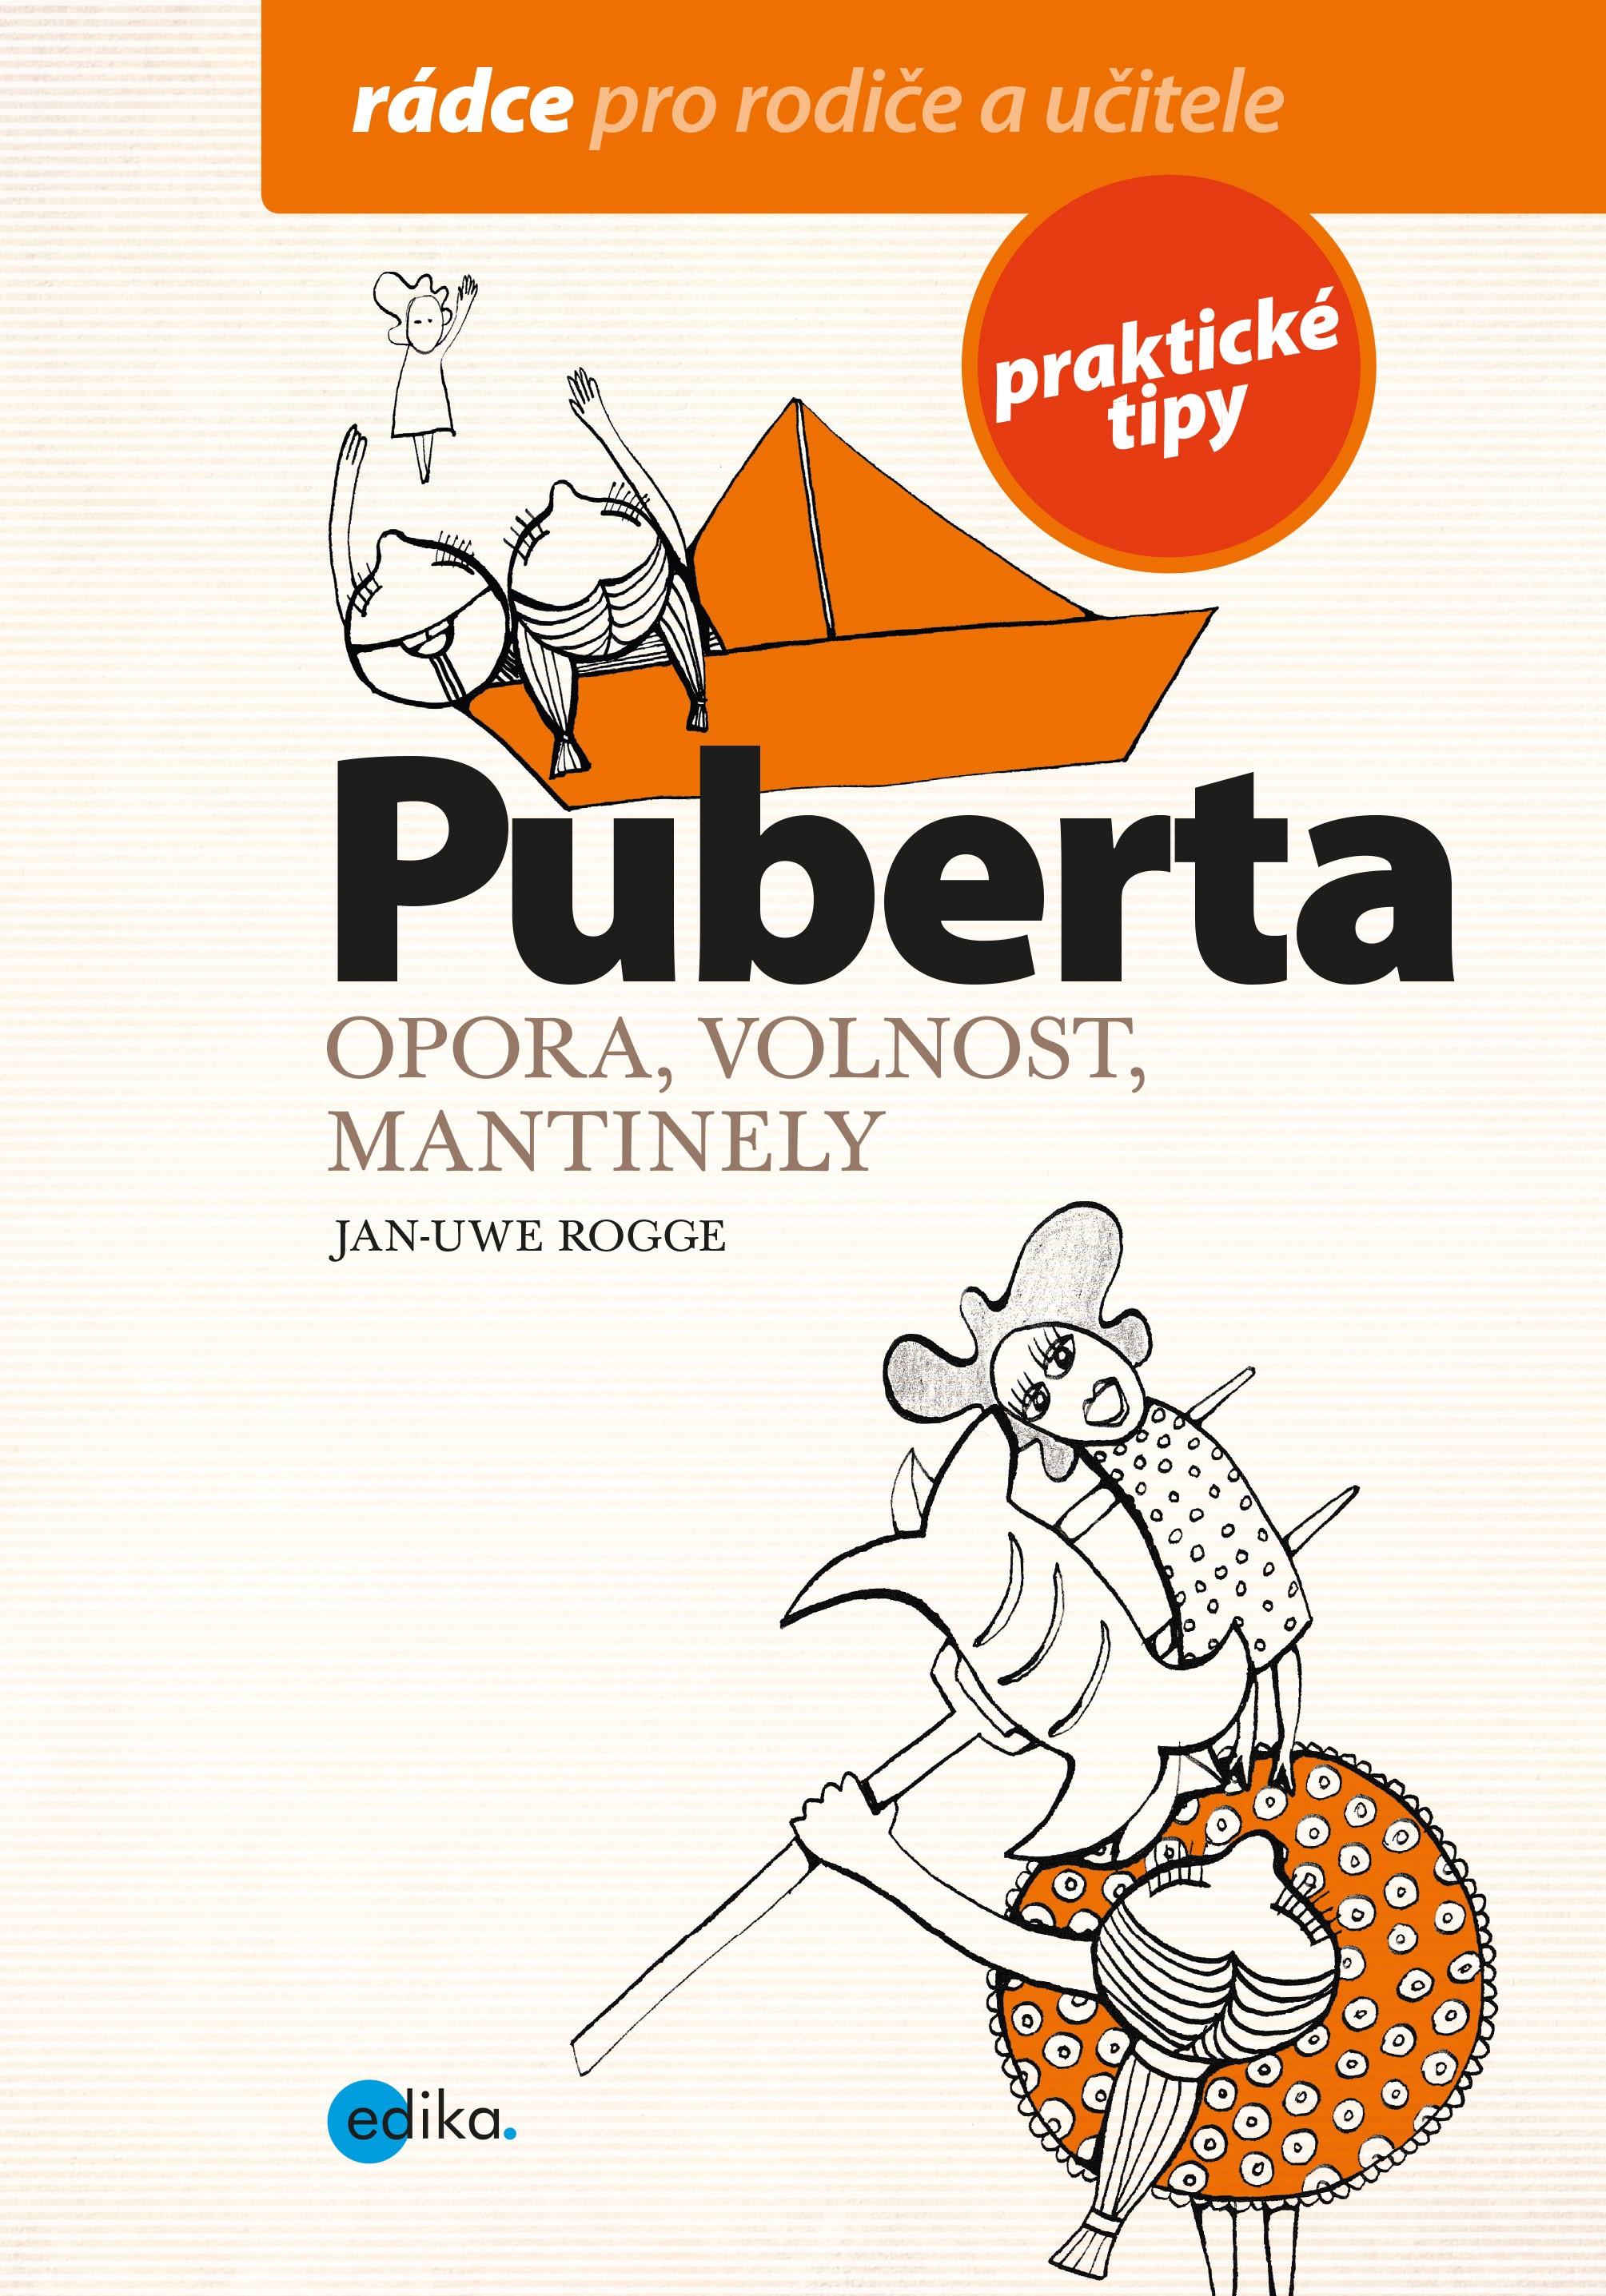 Puberta